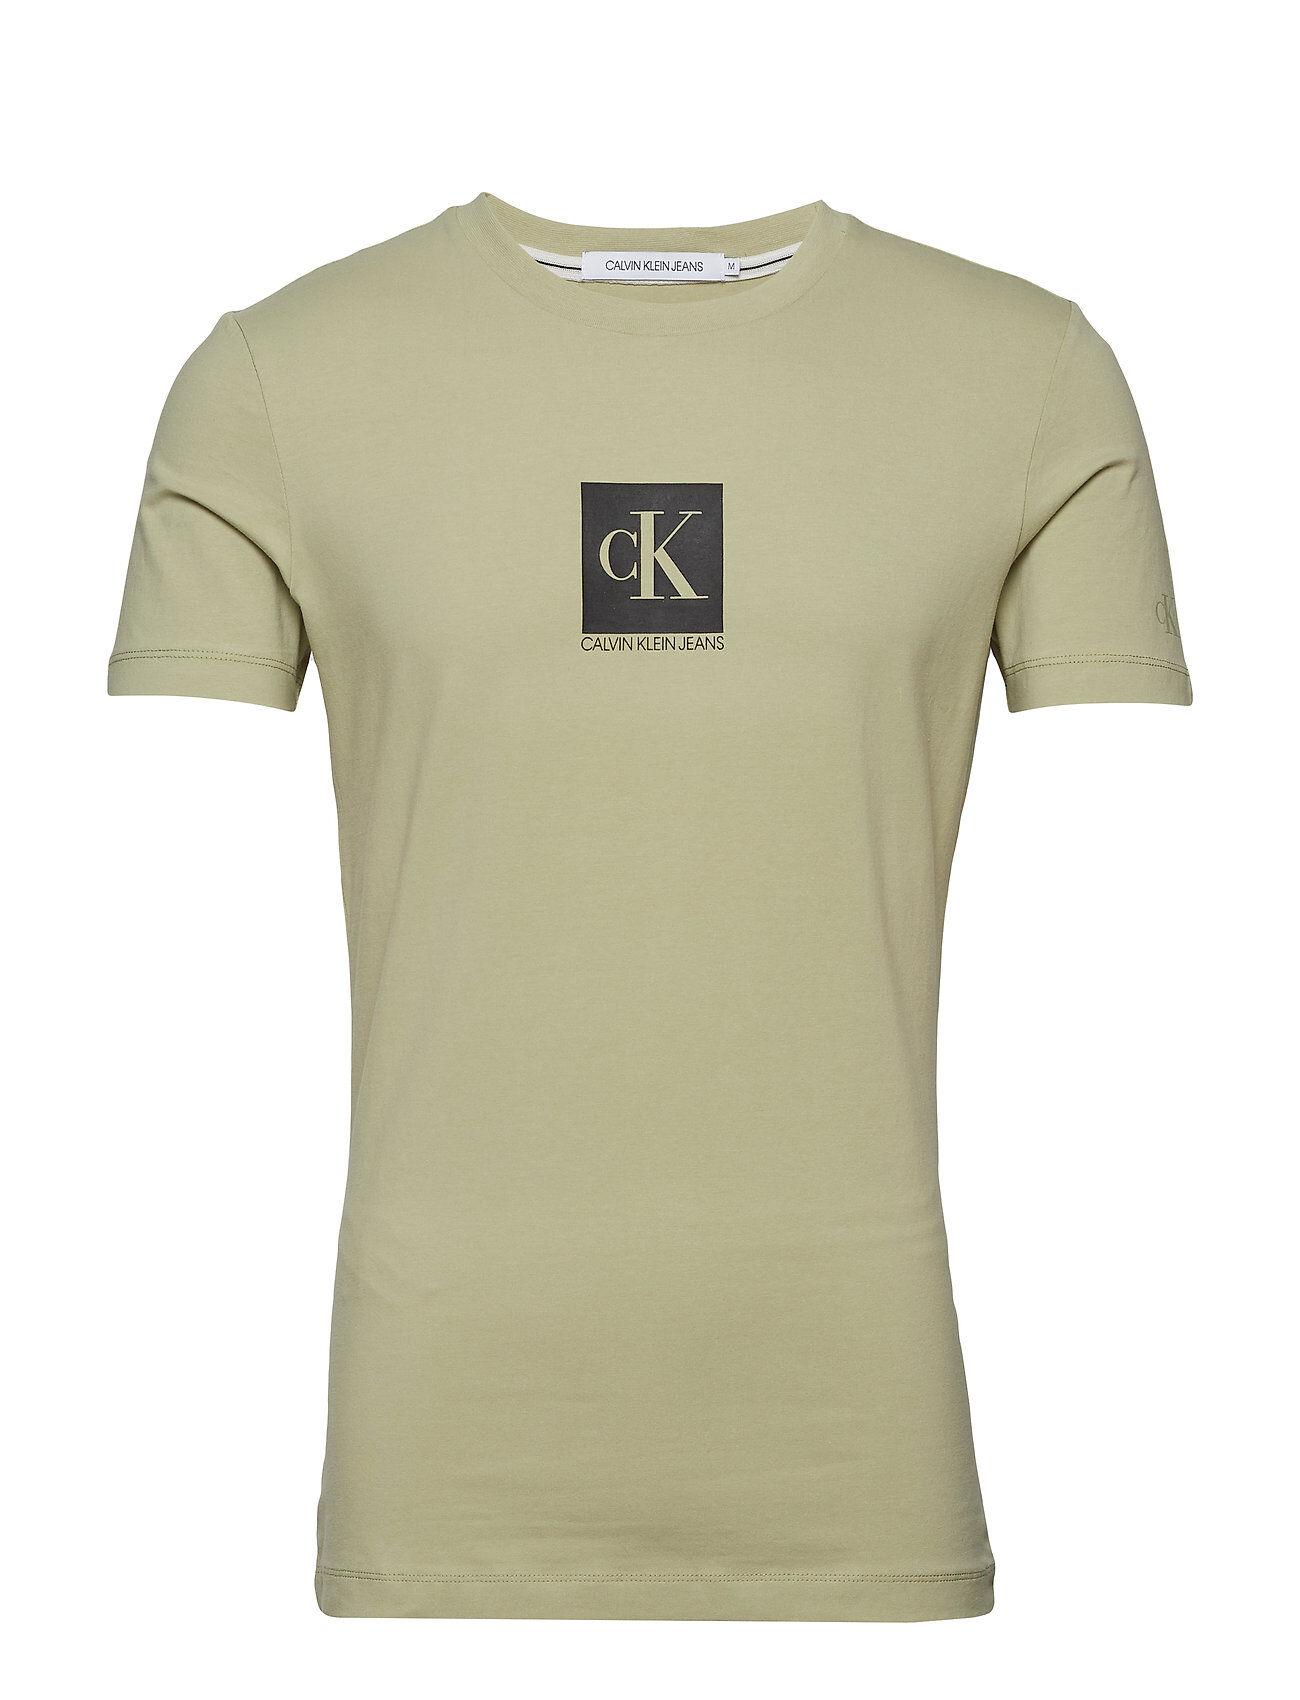 Image of Calvin Center Monogram Box Slim Tee T-shirts Short-sleeved Vihreä Calvin Klein Jeans